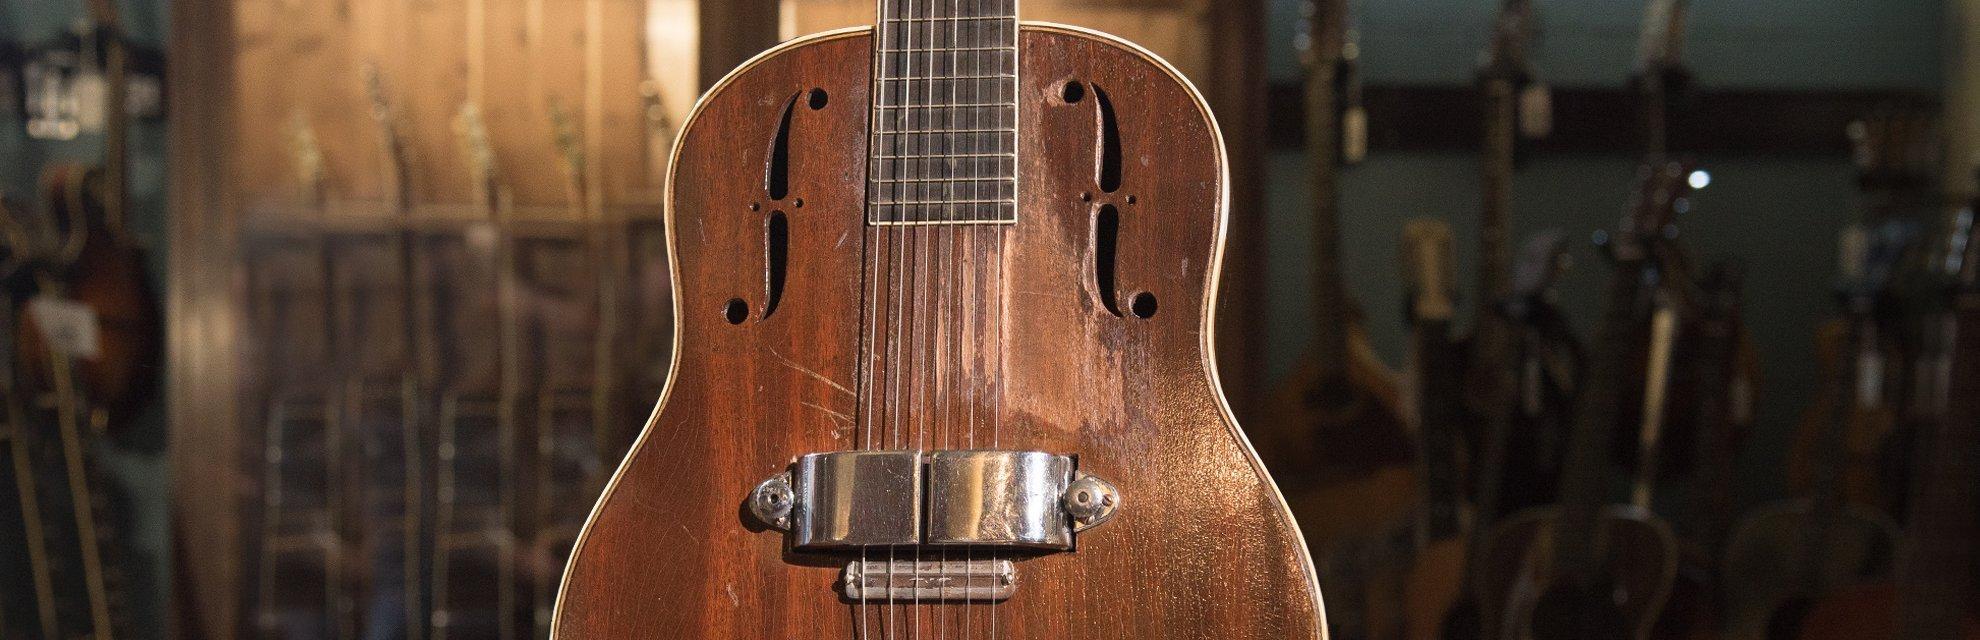 Placeholder Image for Guitar Refurb.jpg